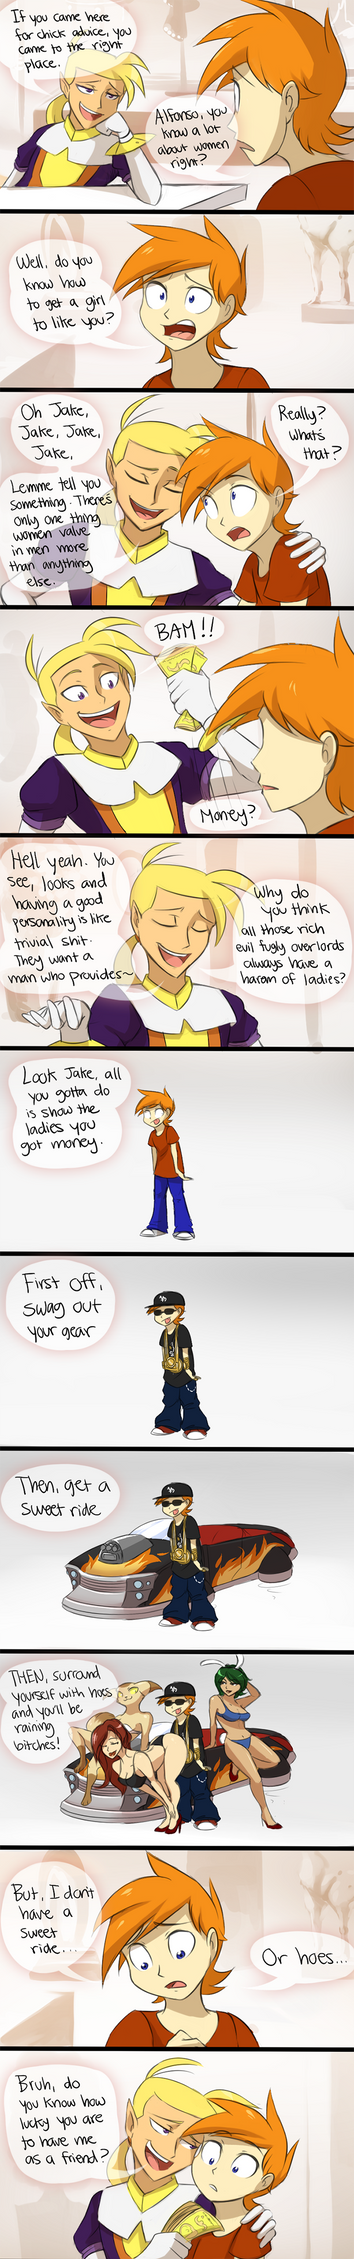 OTP Part 6: Jake Seeks Advice (part 1/2) by DragginCat